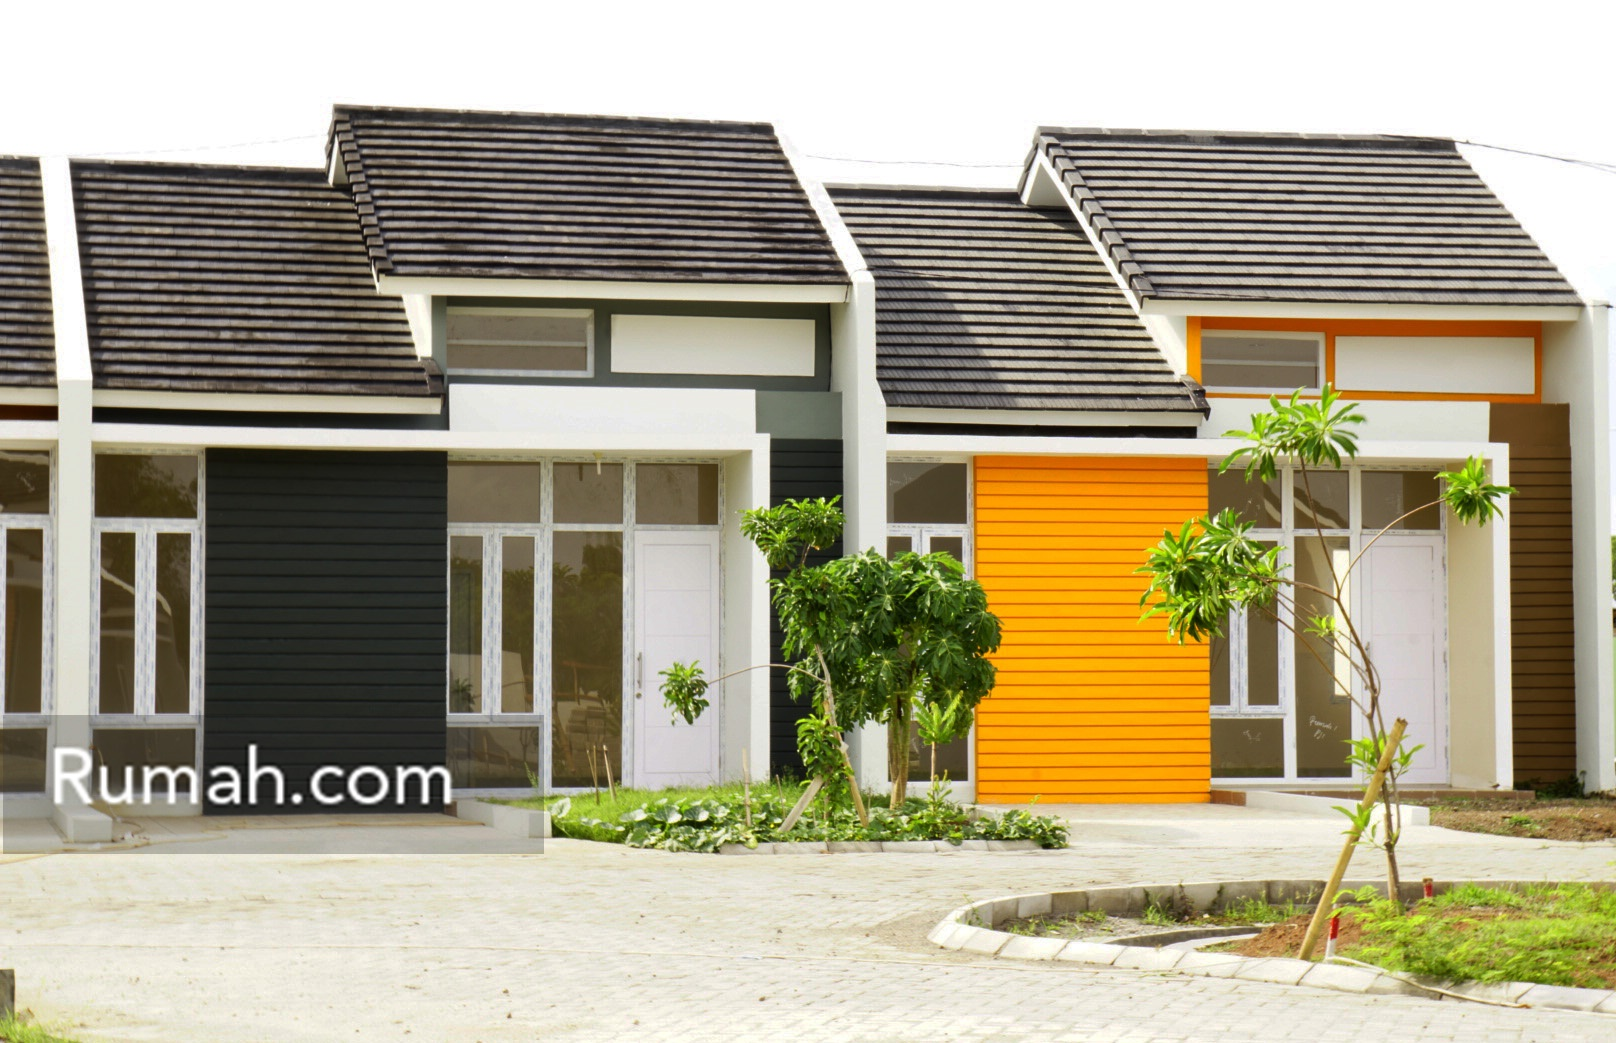 460+ Gambar Rumah Btn Serang Banten HD Terbaru